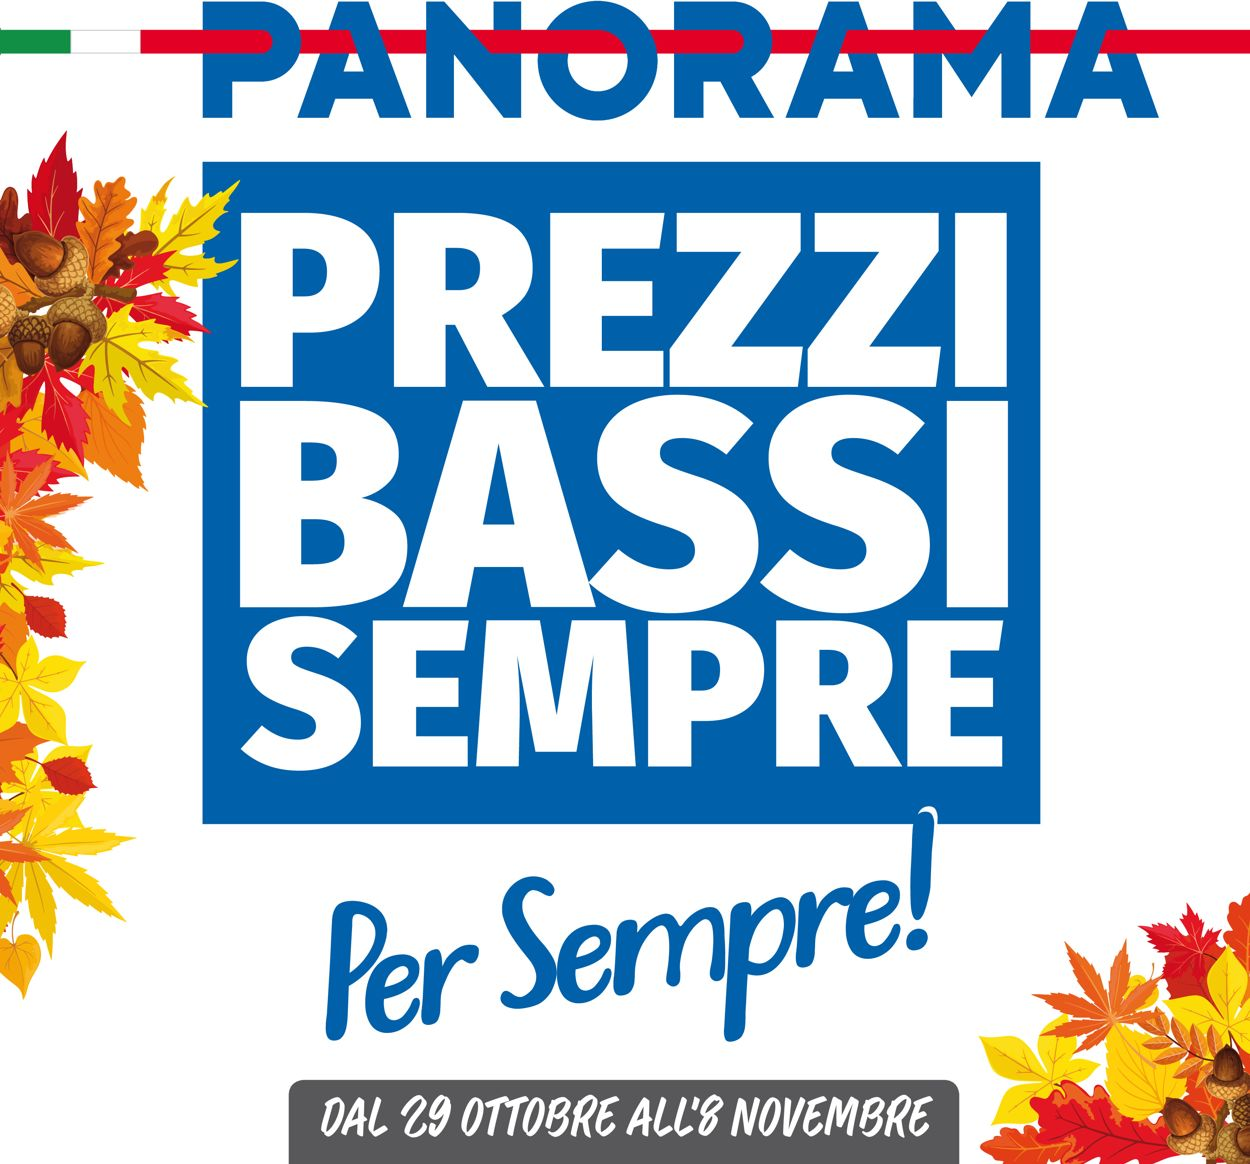 Volantino Pam Panorama - Offerte 29/10-08/11/2020